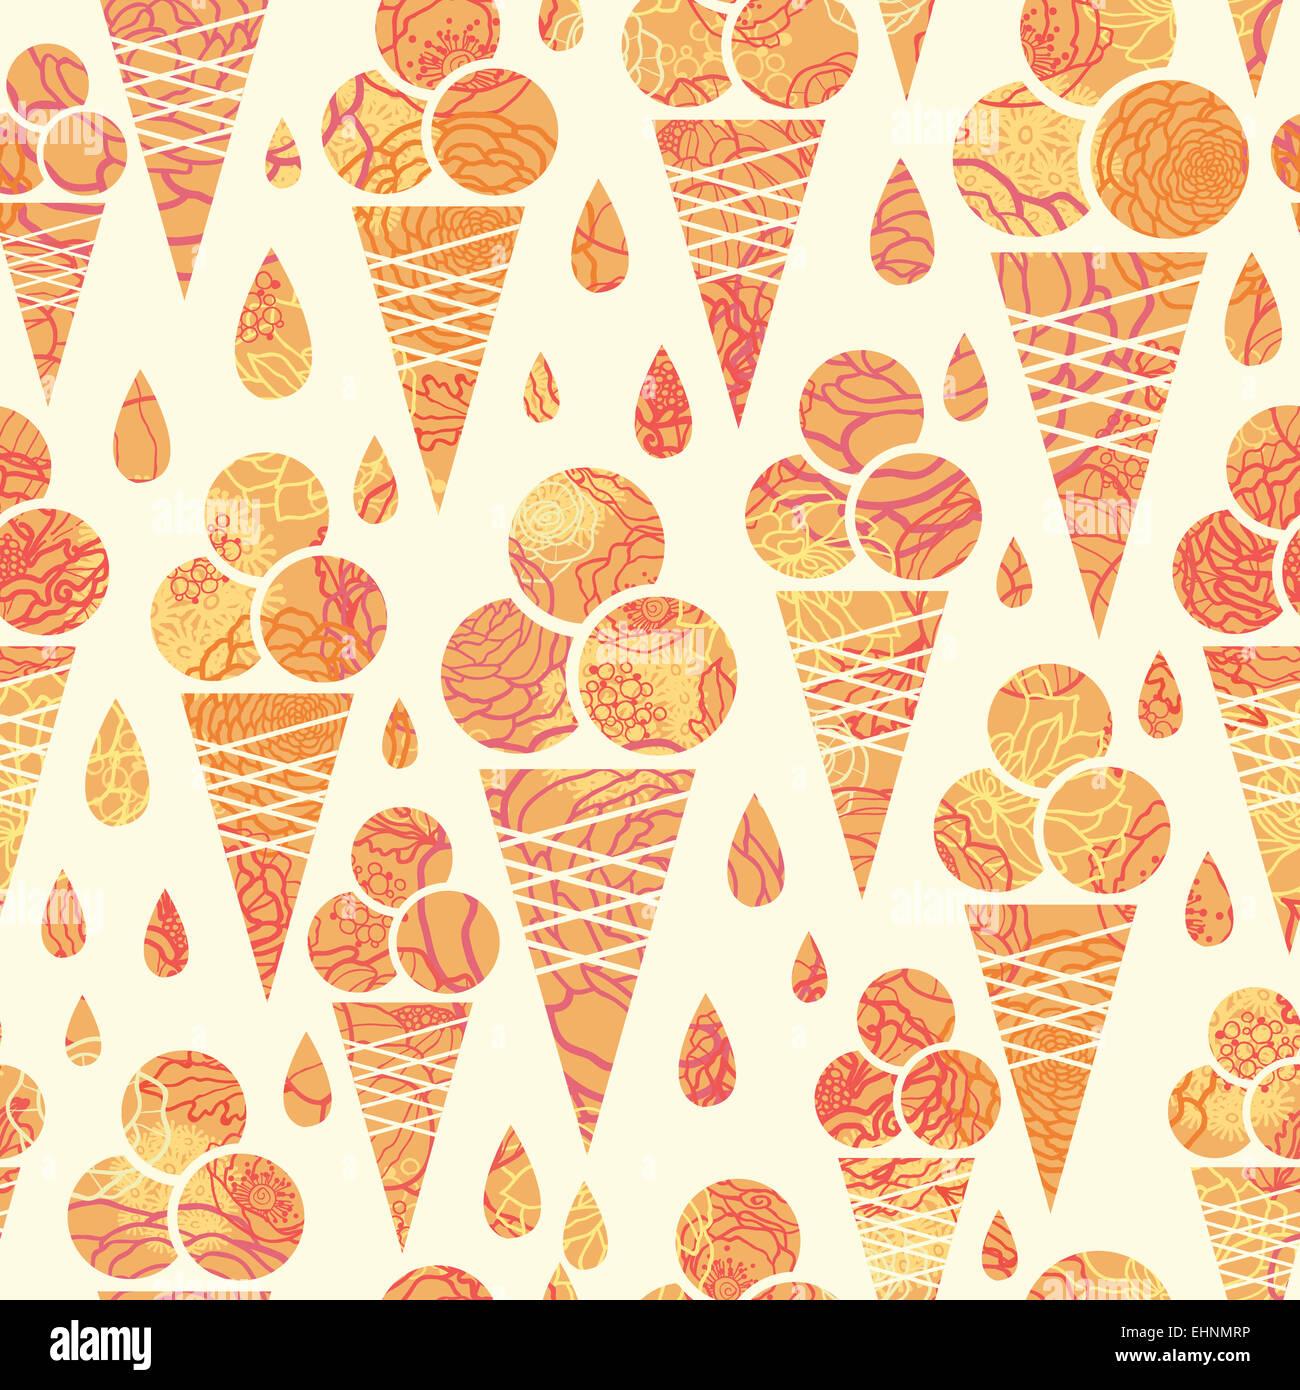 Summer Ice Cream Wallpaper: Summer Ice Cream Cones Seamless Pattern Background Stock